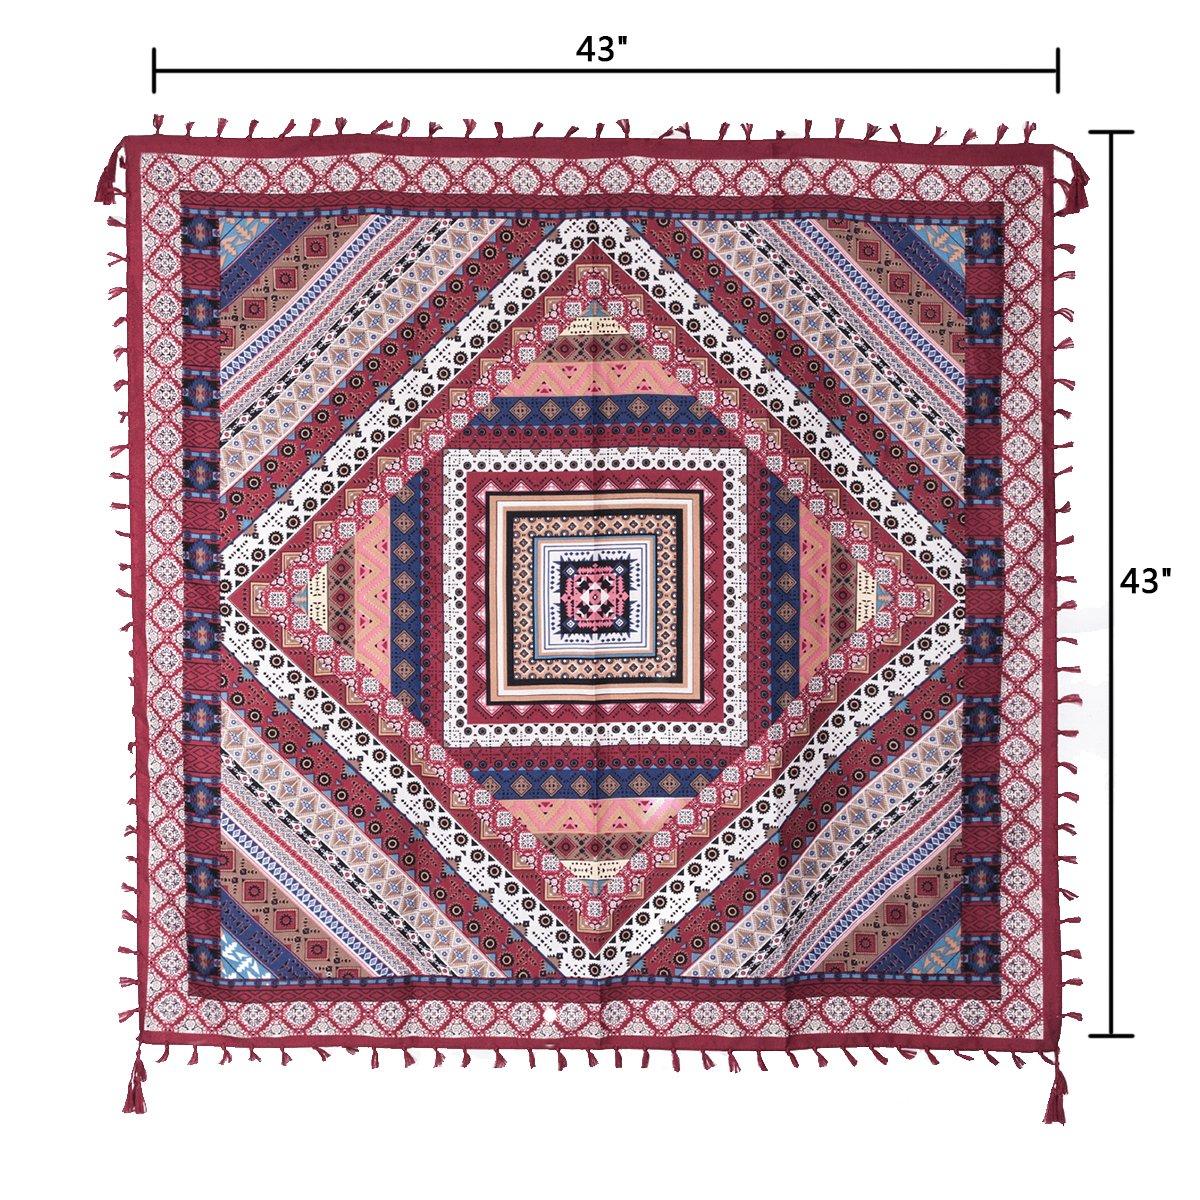 EVRFELAN Women Boho Scarf Tassel Shawl Tapestry Tablecloth Beach Towel Picnic Throw Wall Hanging Yoga Mat Ladies Cotton Scarves by Popular Handicrafts (Red2)